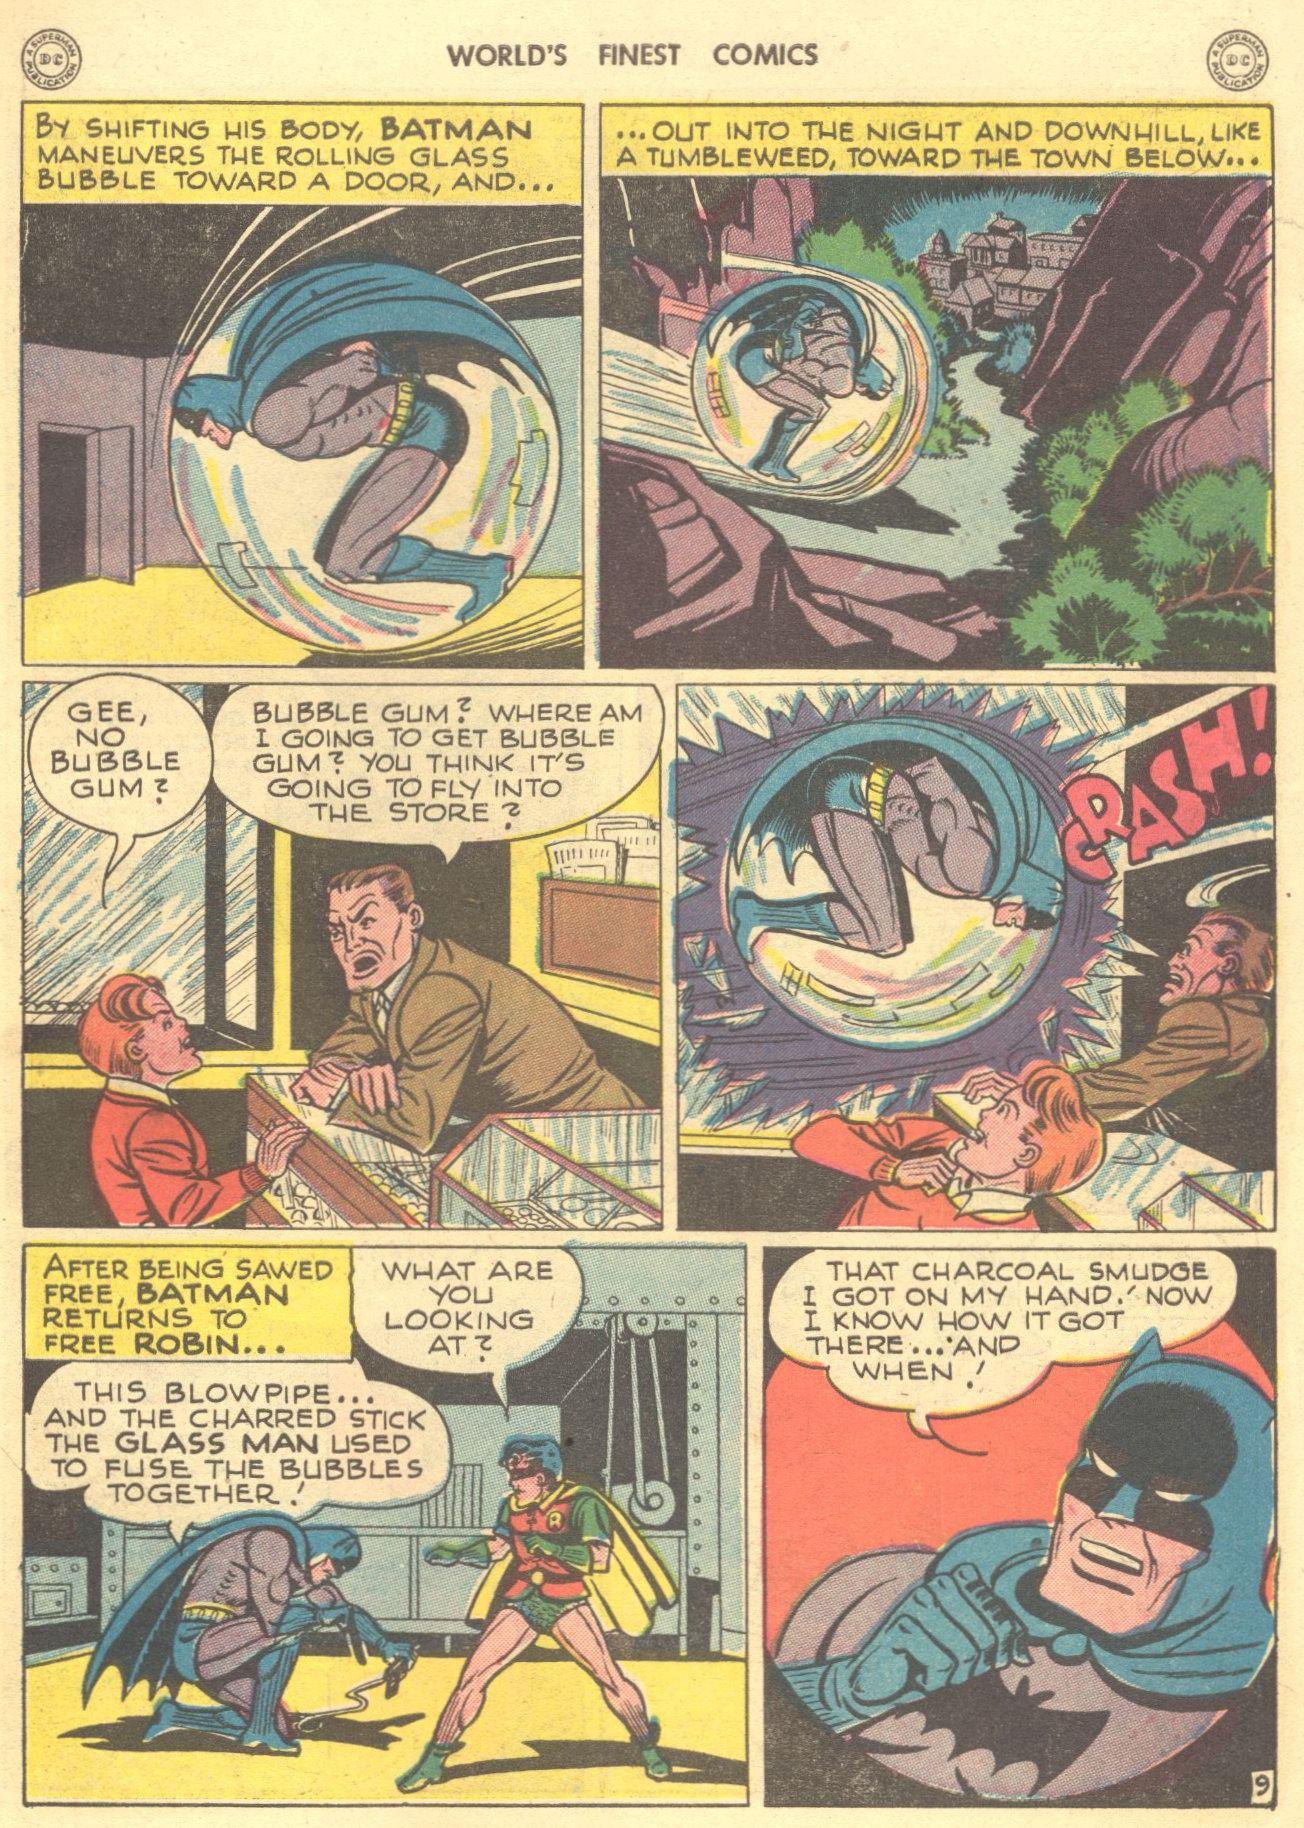 Read online World's Finest Comics comic -  Issue #28 - 68